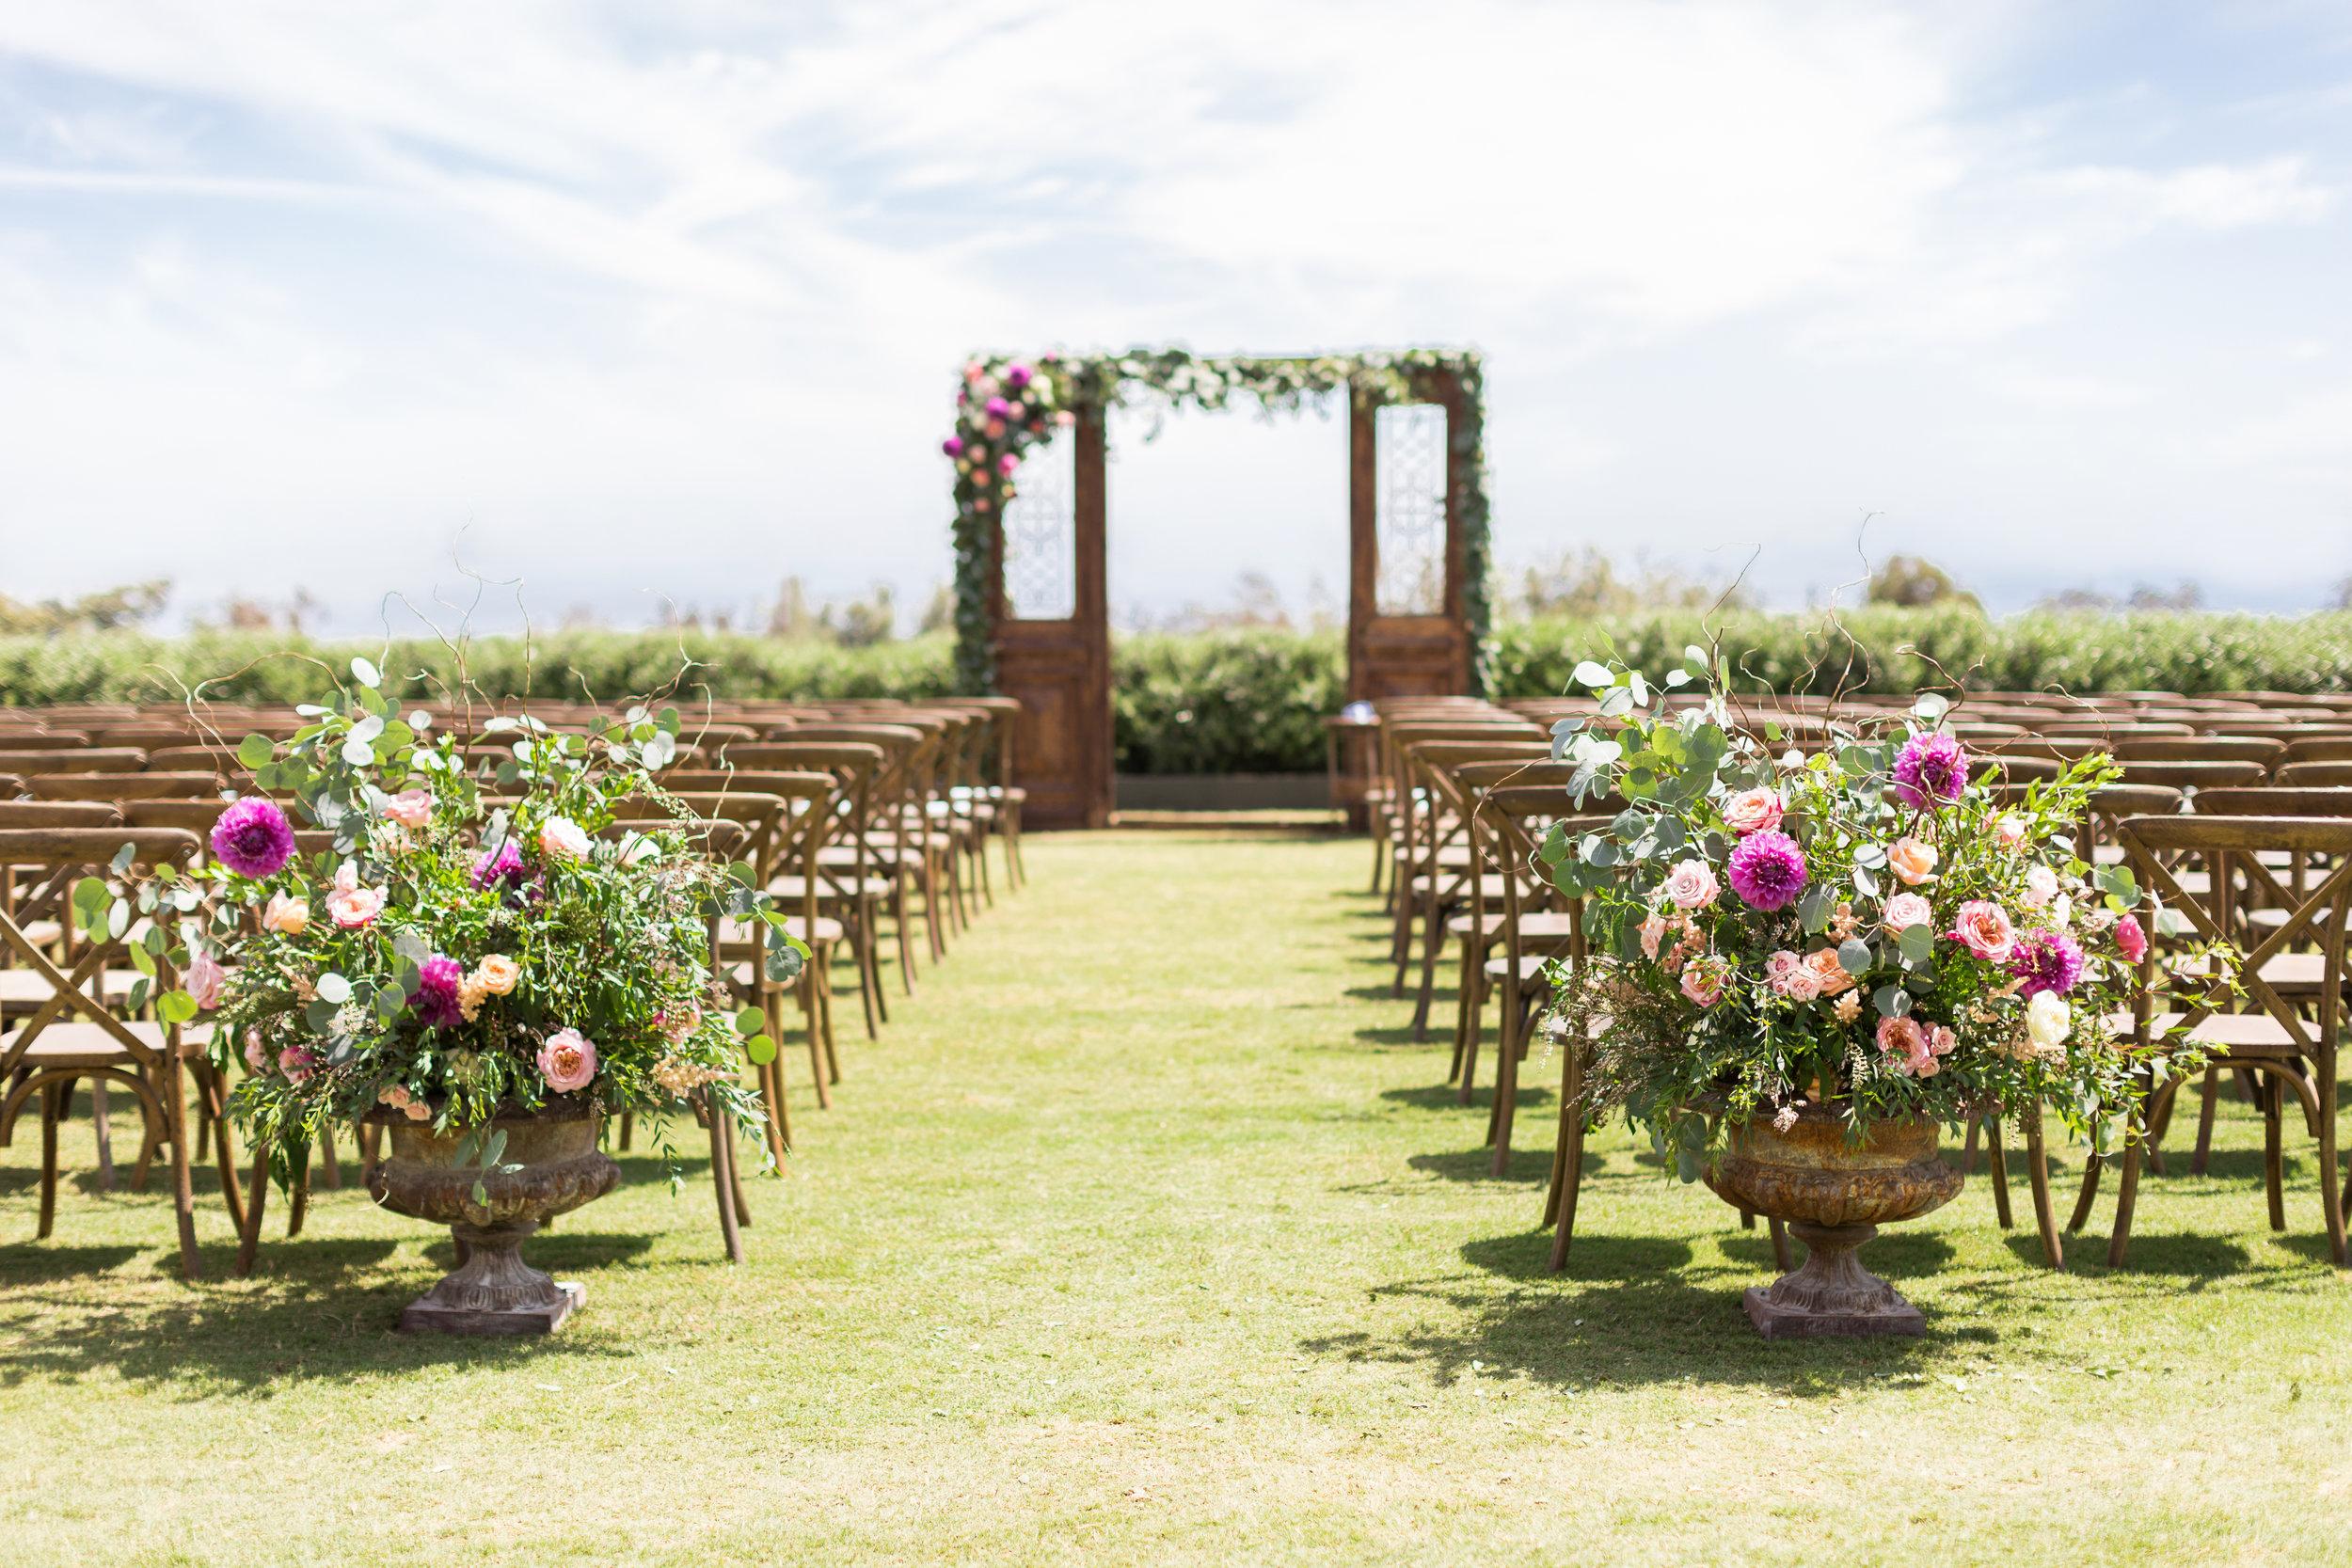 molly-terrill-wedding-preview-4.jpg